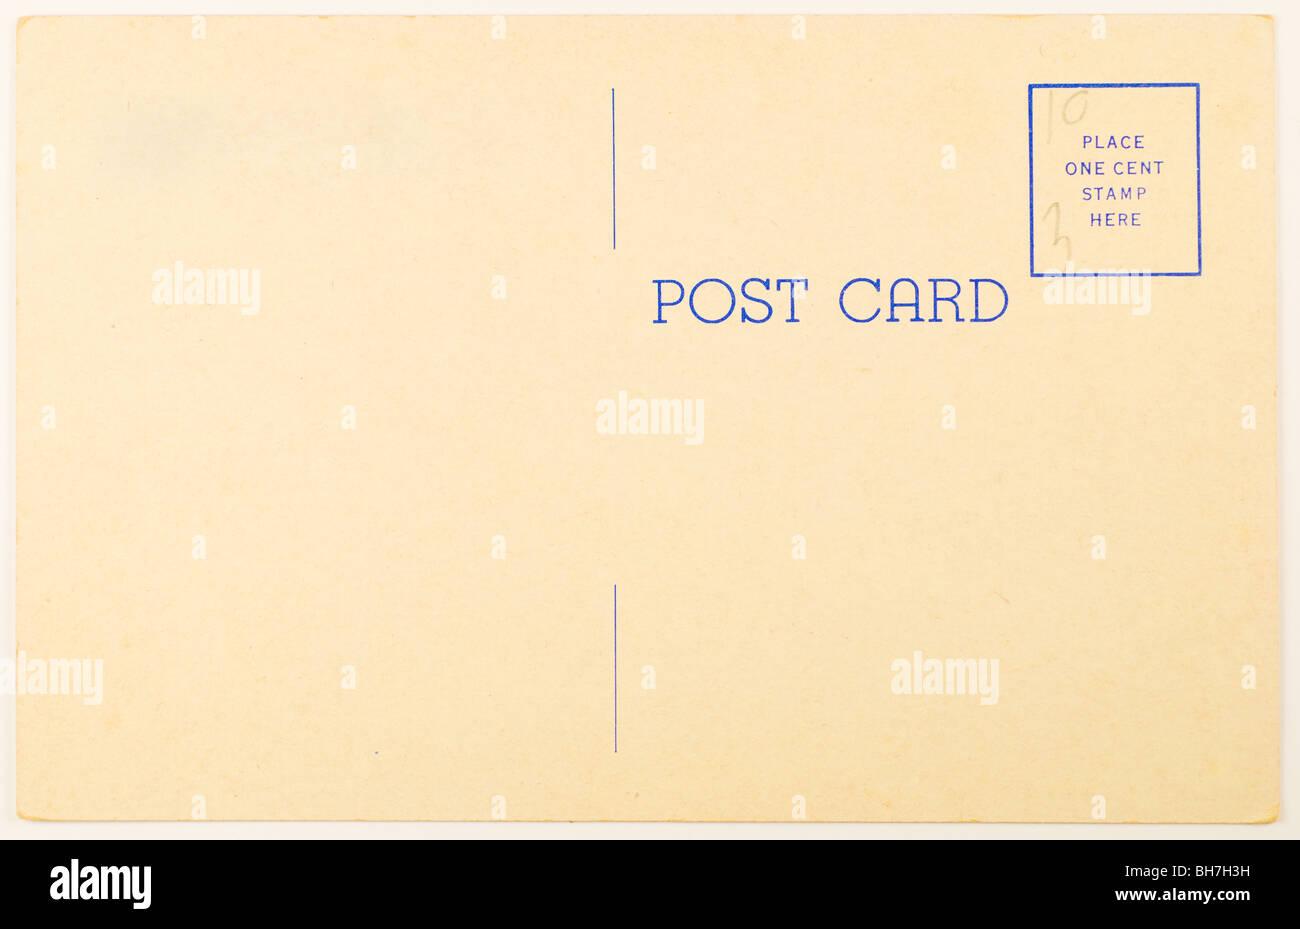 Retro Bakelite Radio Die Cut Days Gone By Blank Postcard w//Mailing Envelope NEW